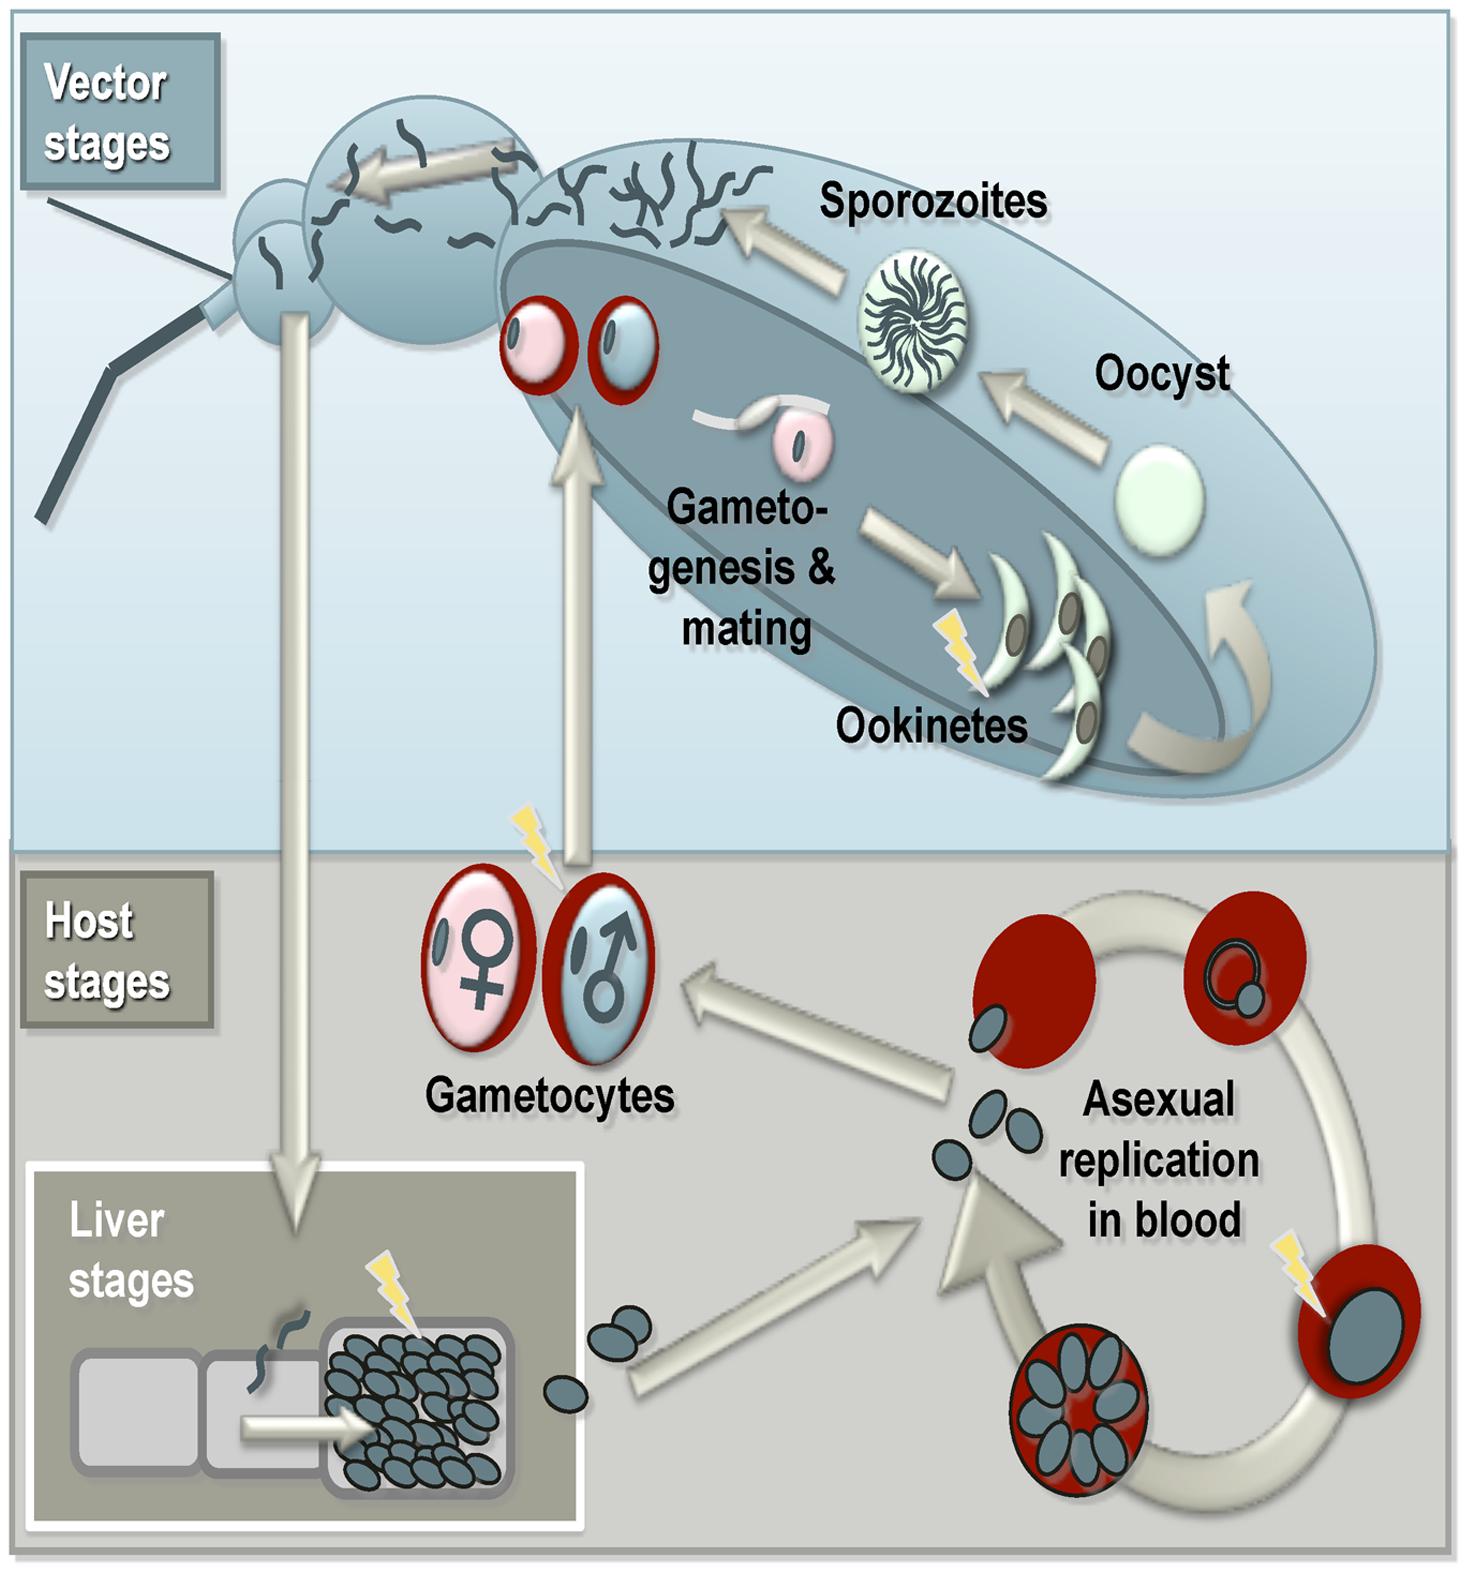 Summary of the malaria life cycle and apoptosis.